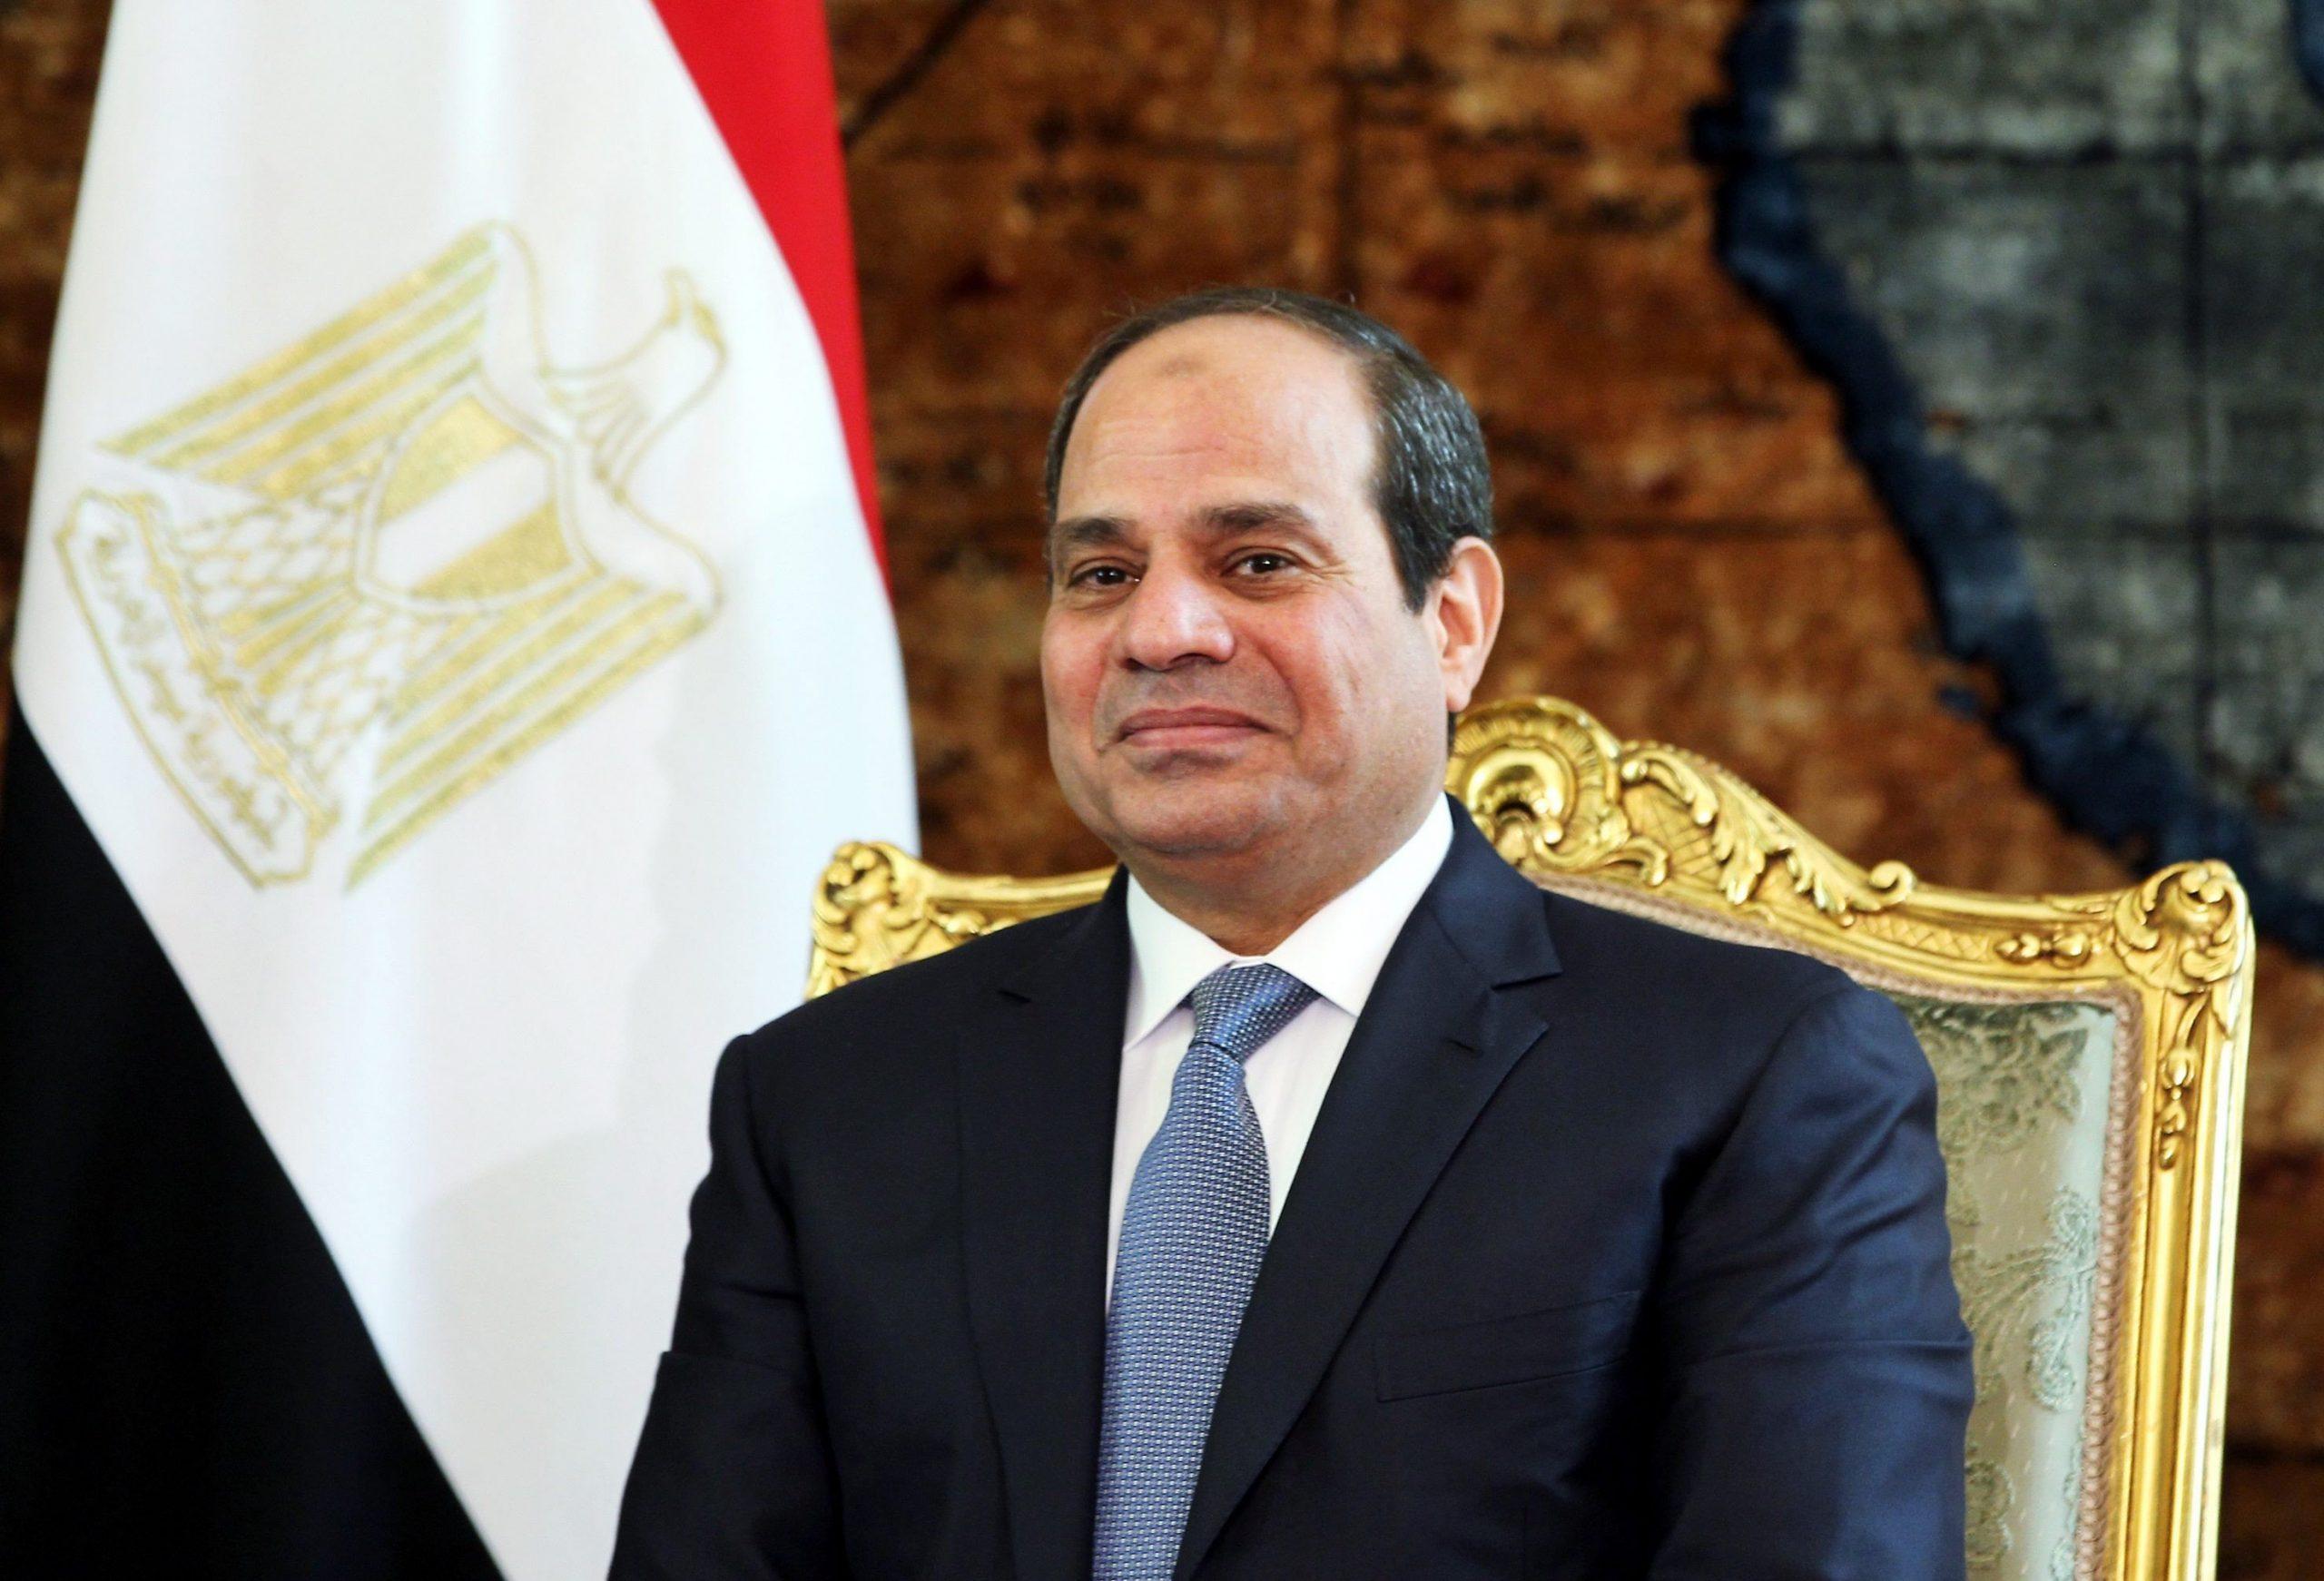 President of Egypt Receives Credentials of Qatari Ambassador